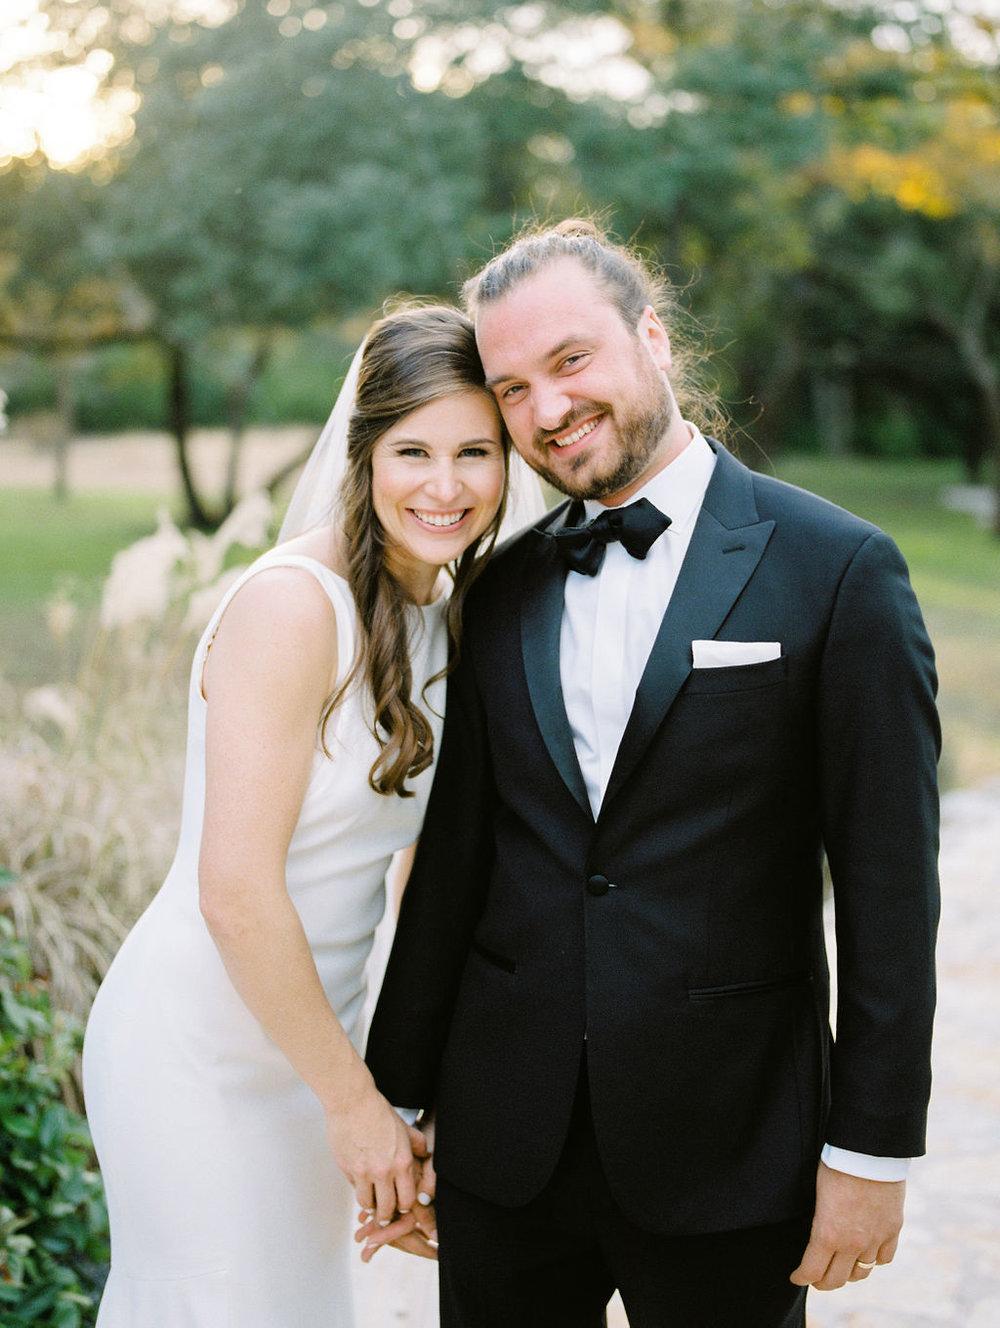 Austin-Texas-Wedding-Photographer-Addison-Grove-Film-118.jpg